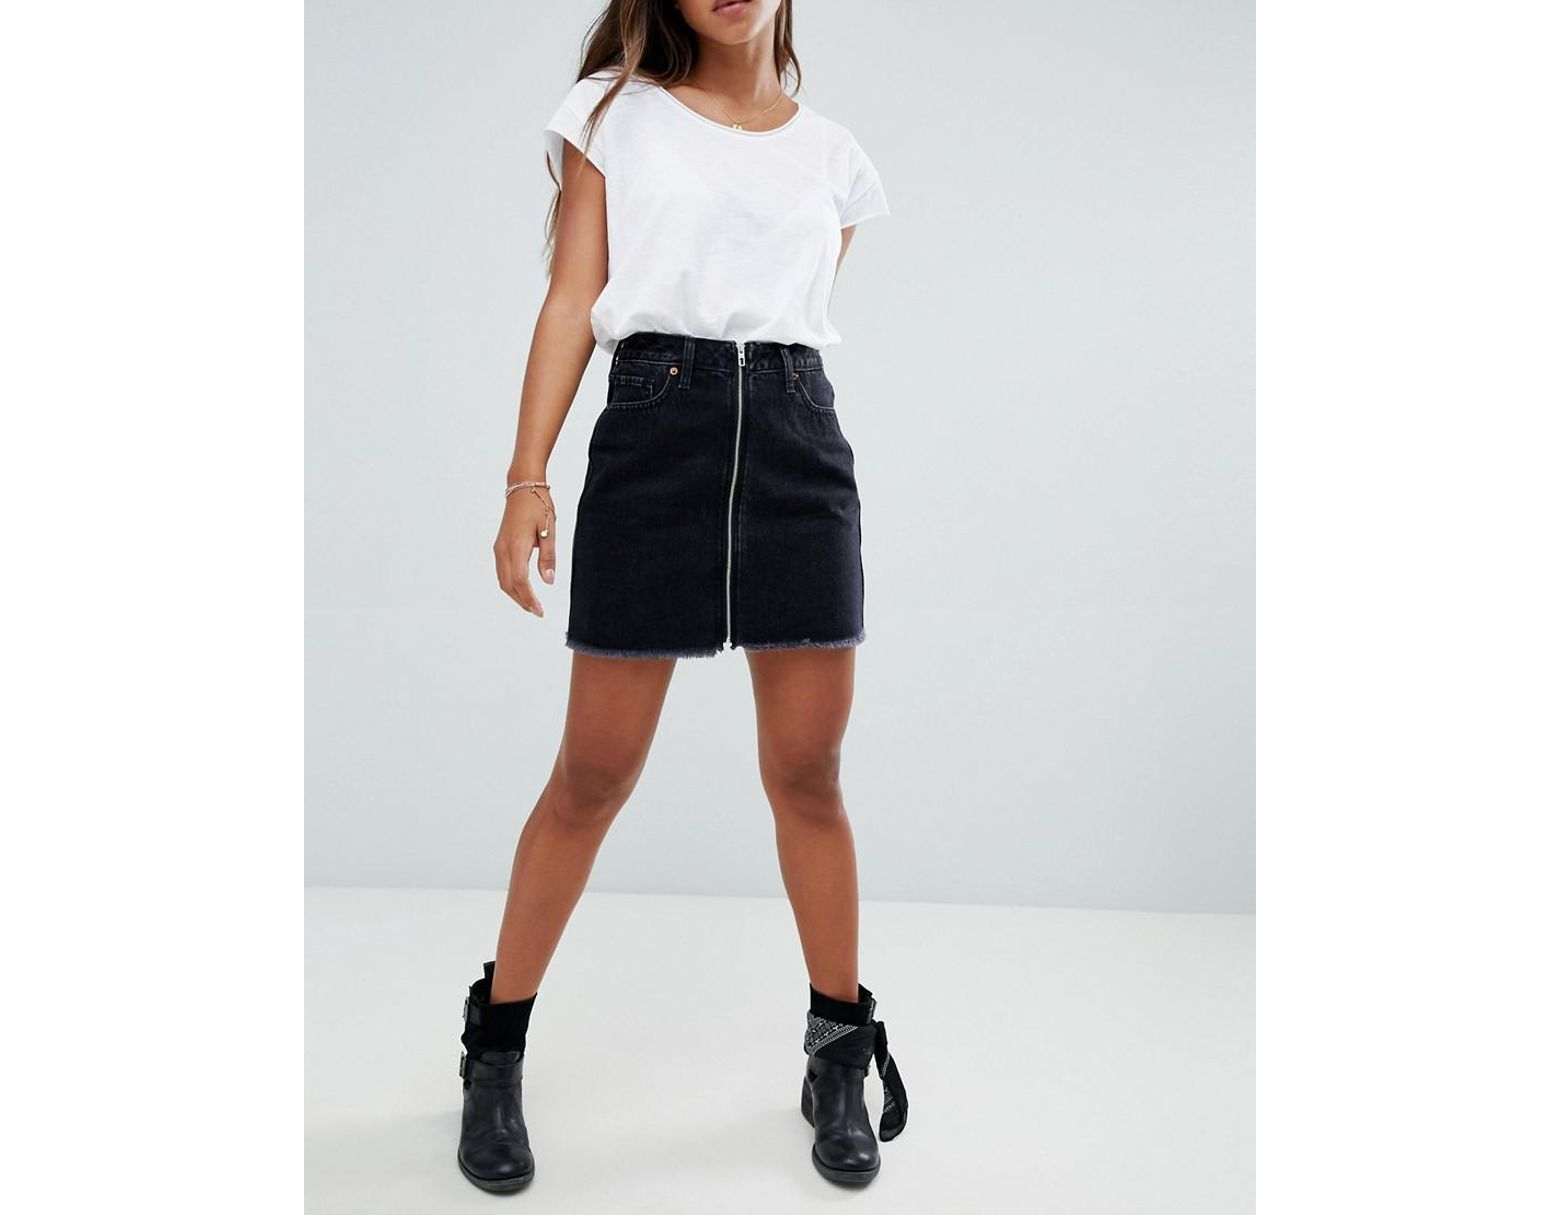 8f08090448 Abercrombie & Fitch Zip Thru Denim Mini Skirt in Black - Lyst